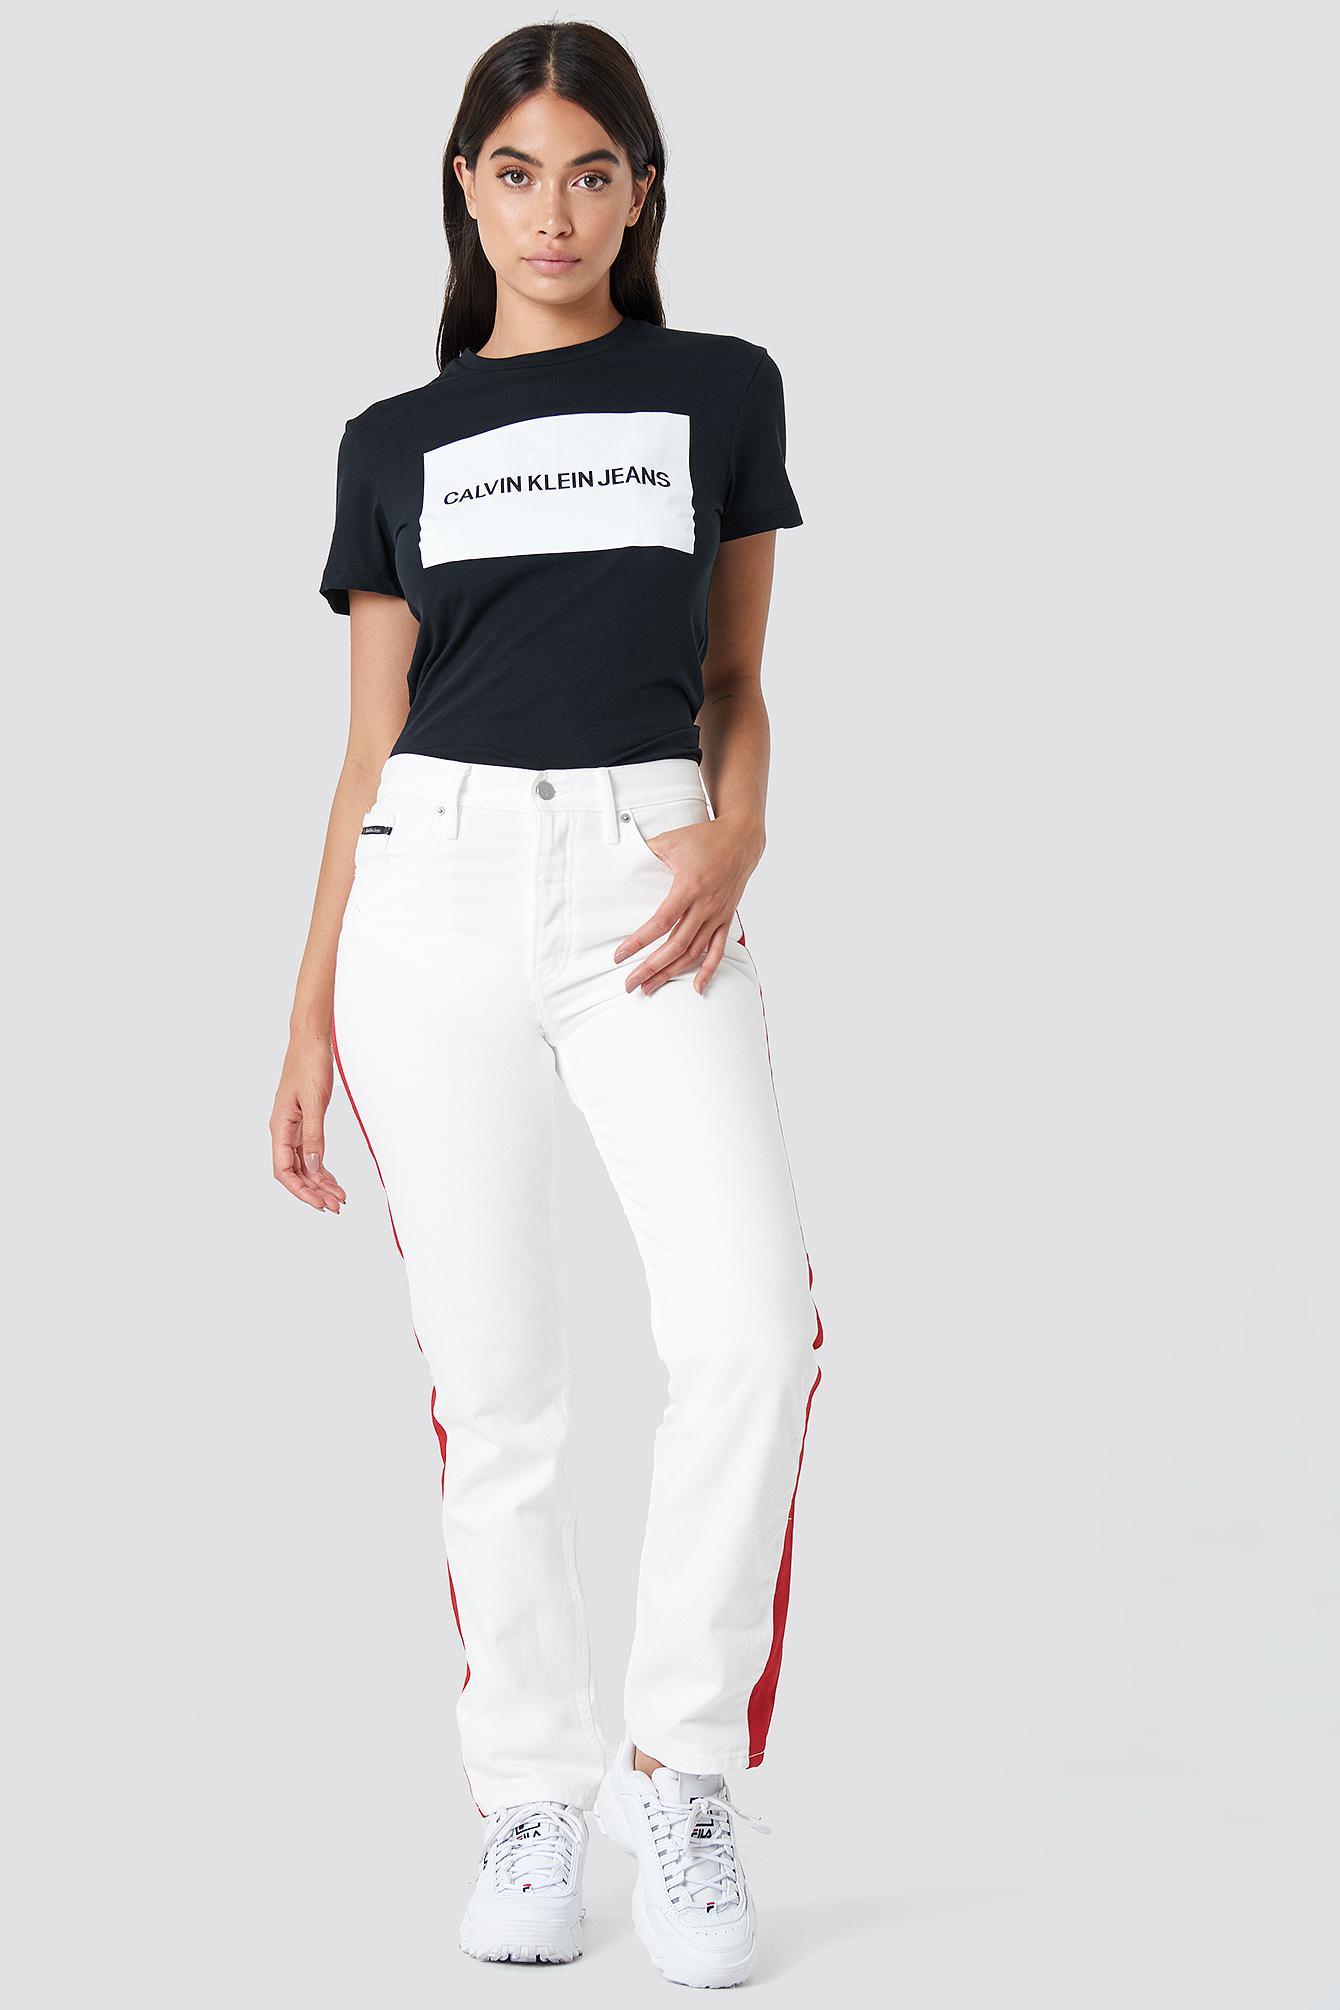 442af7505 Calvin Klein Institutional Box Logo Regular Fit Tee Ck Black in ...